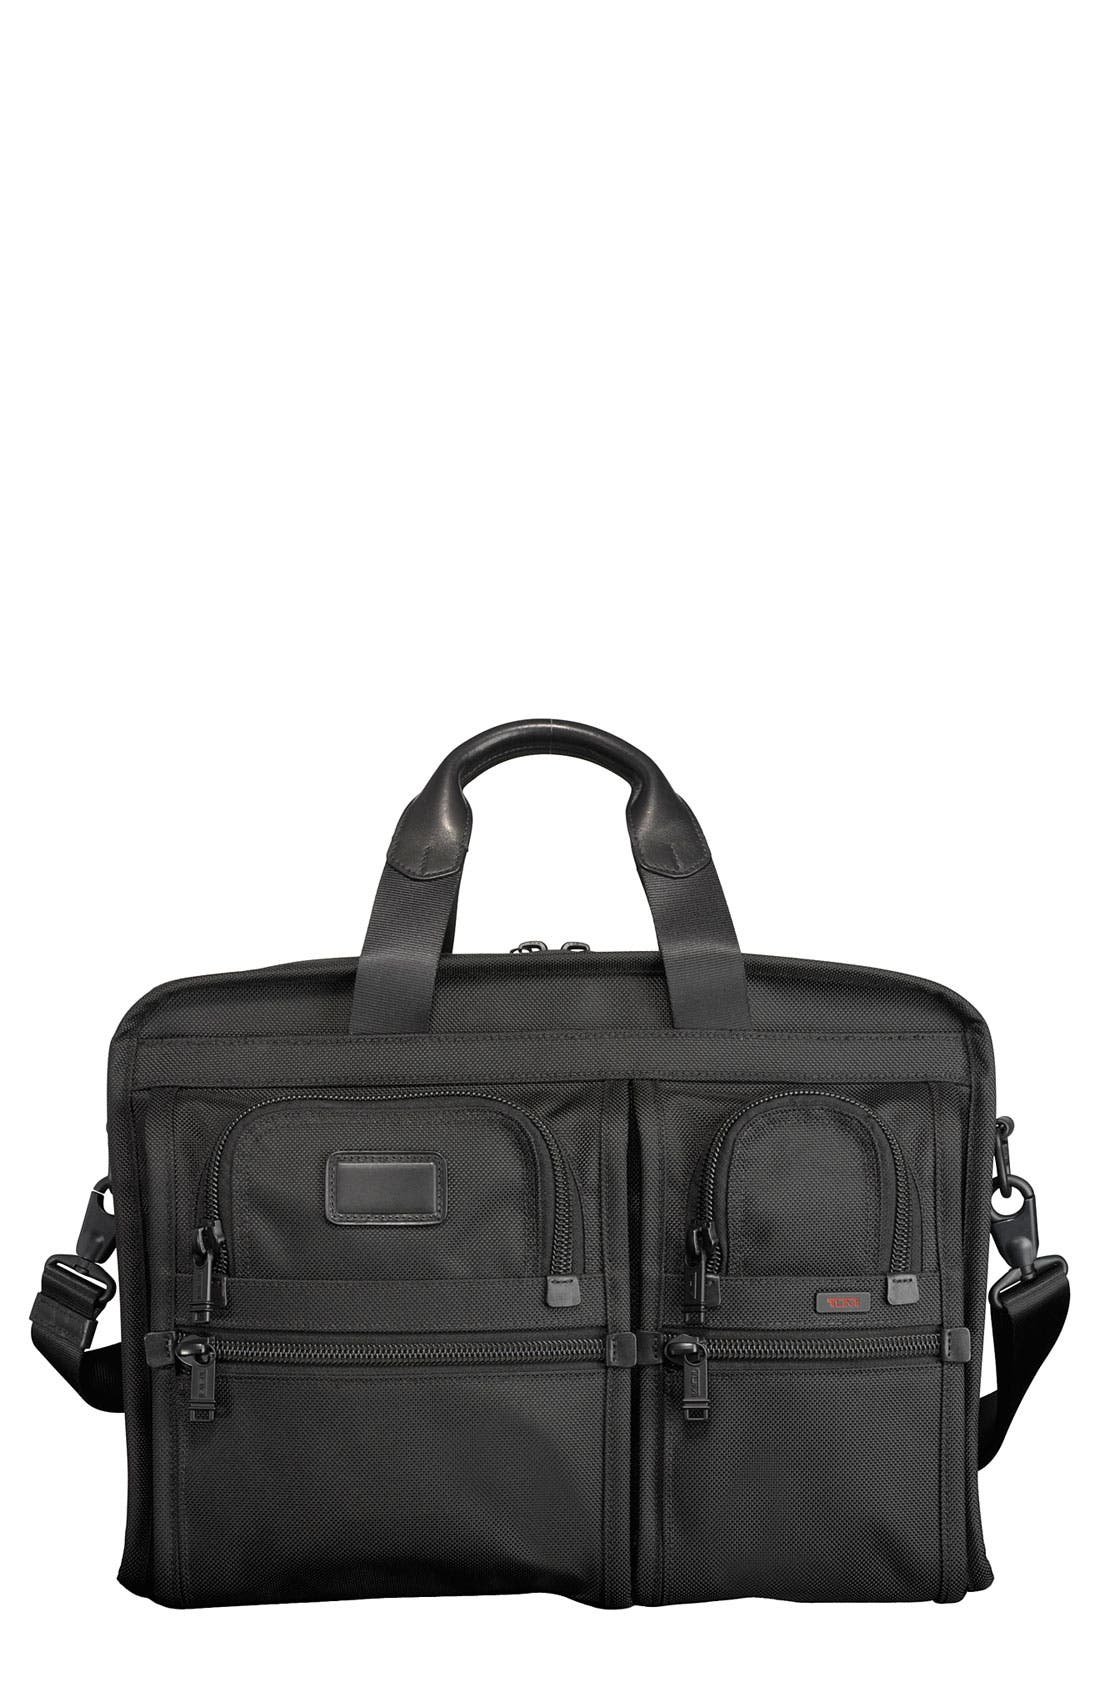 Main Image - Tumi 'Alpha' International Organizer Briefcase